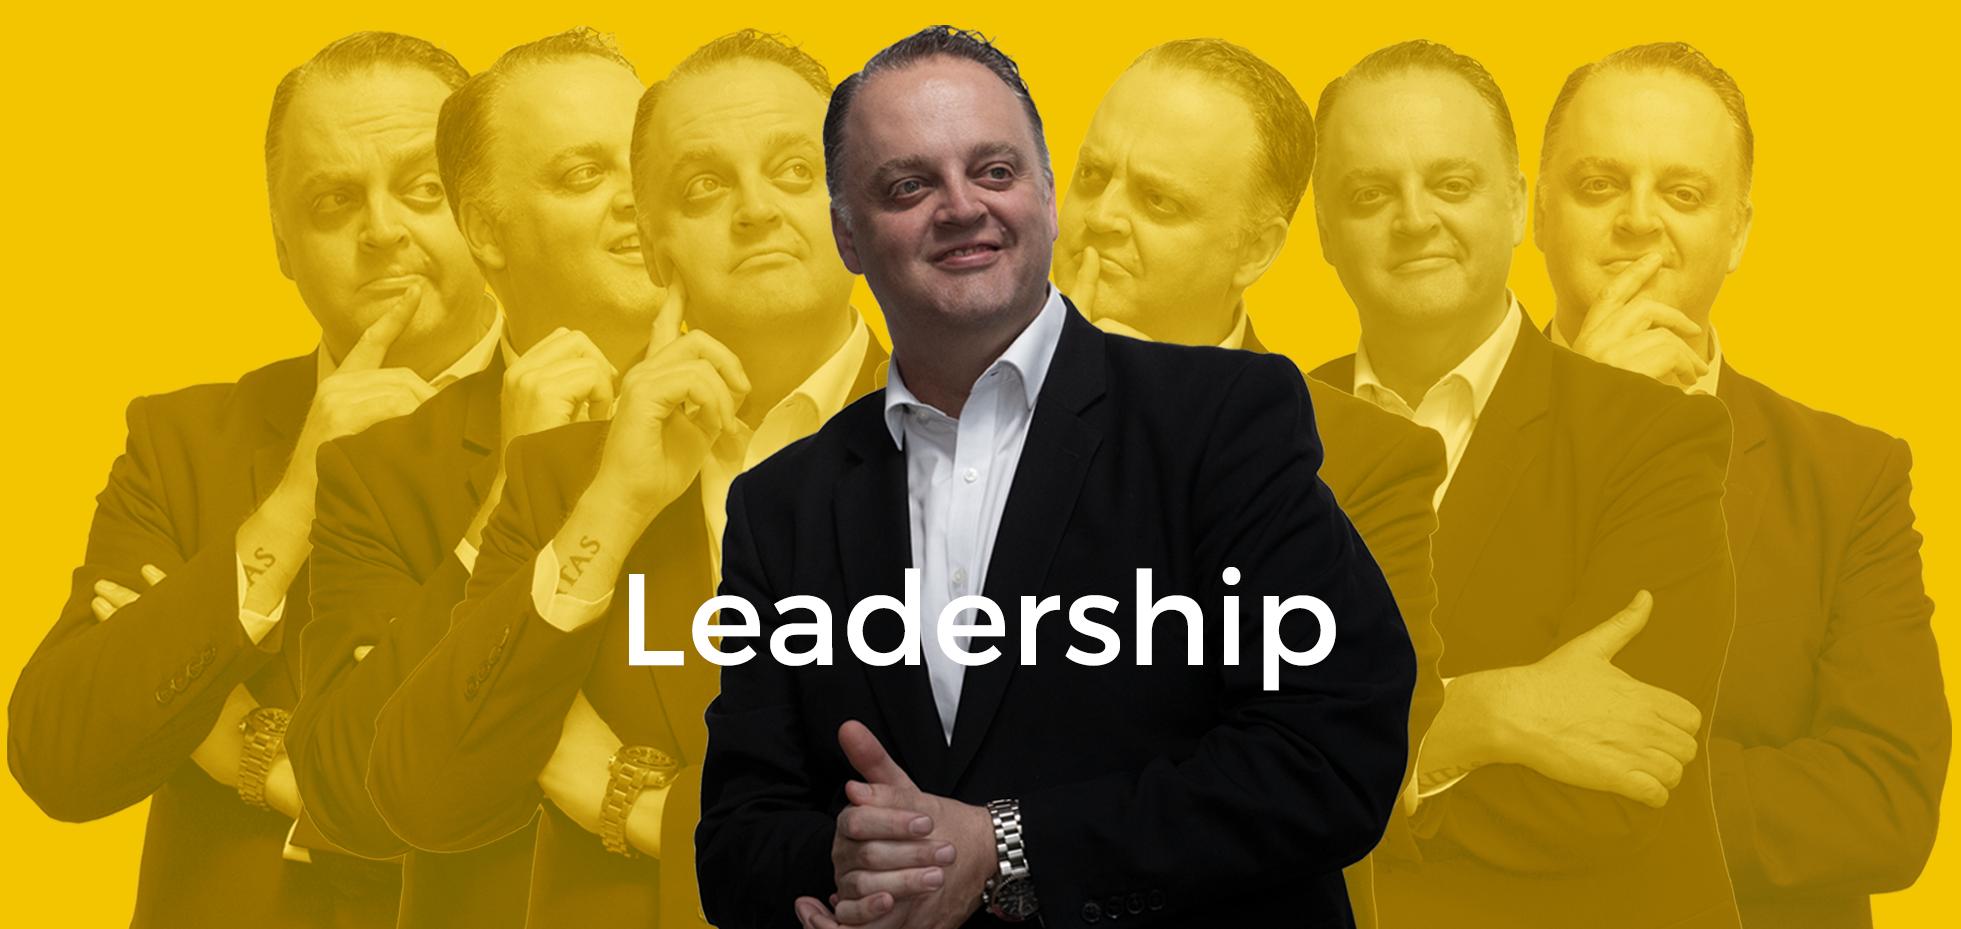 DanGregory.co Title Images - Leadership II.png